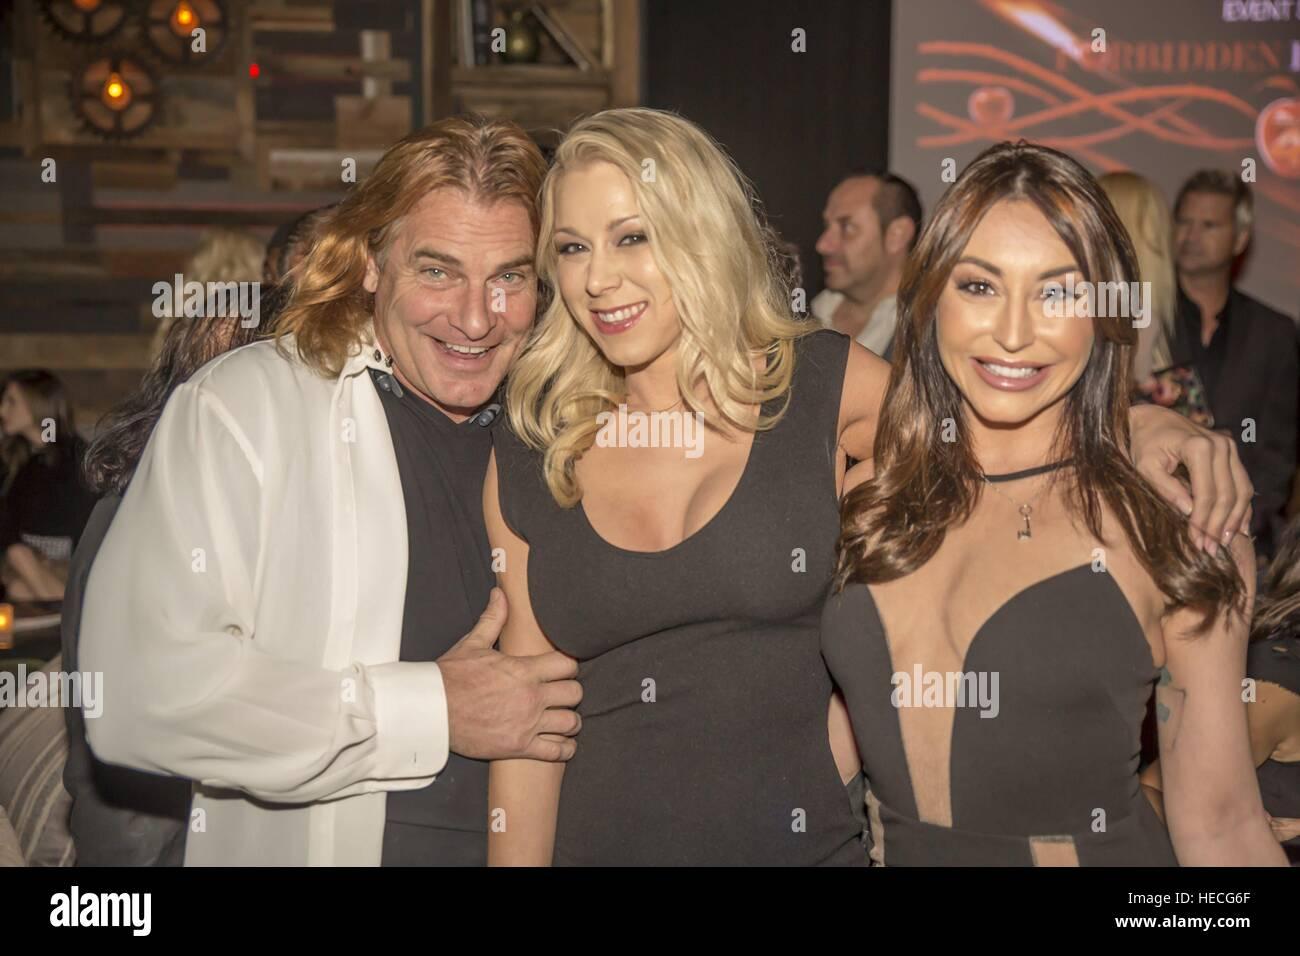 Arreyon Ford nude photos 2019